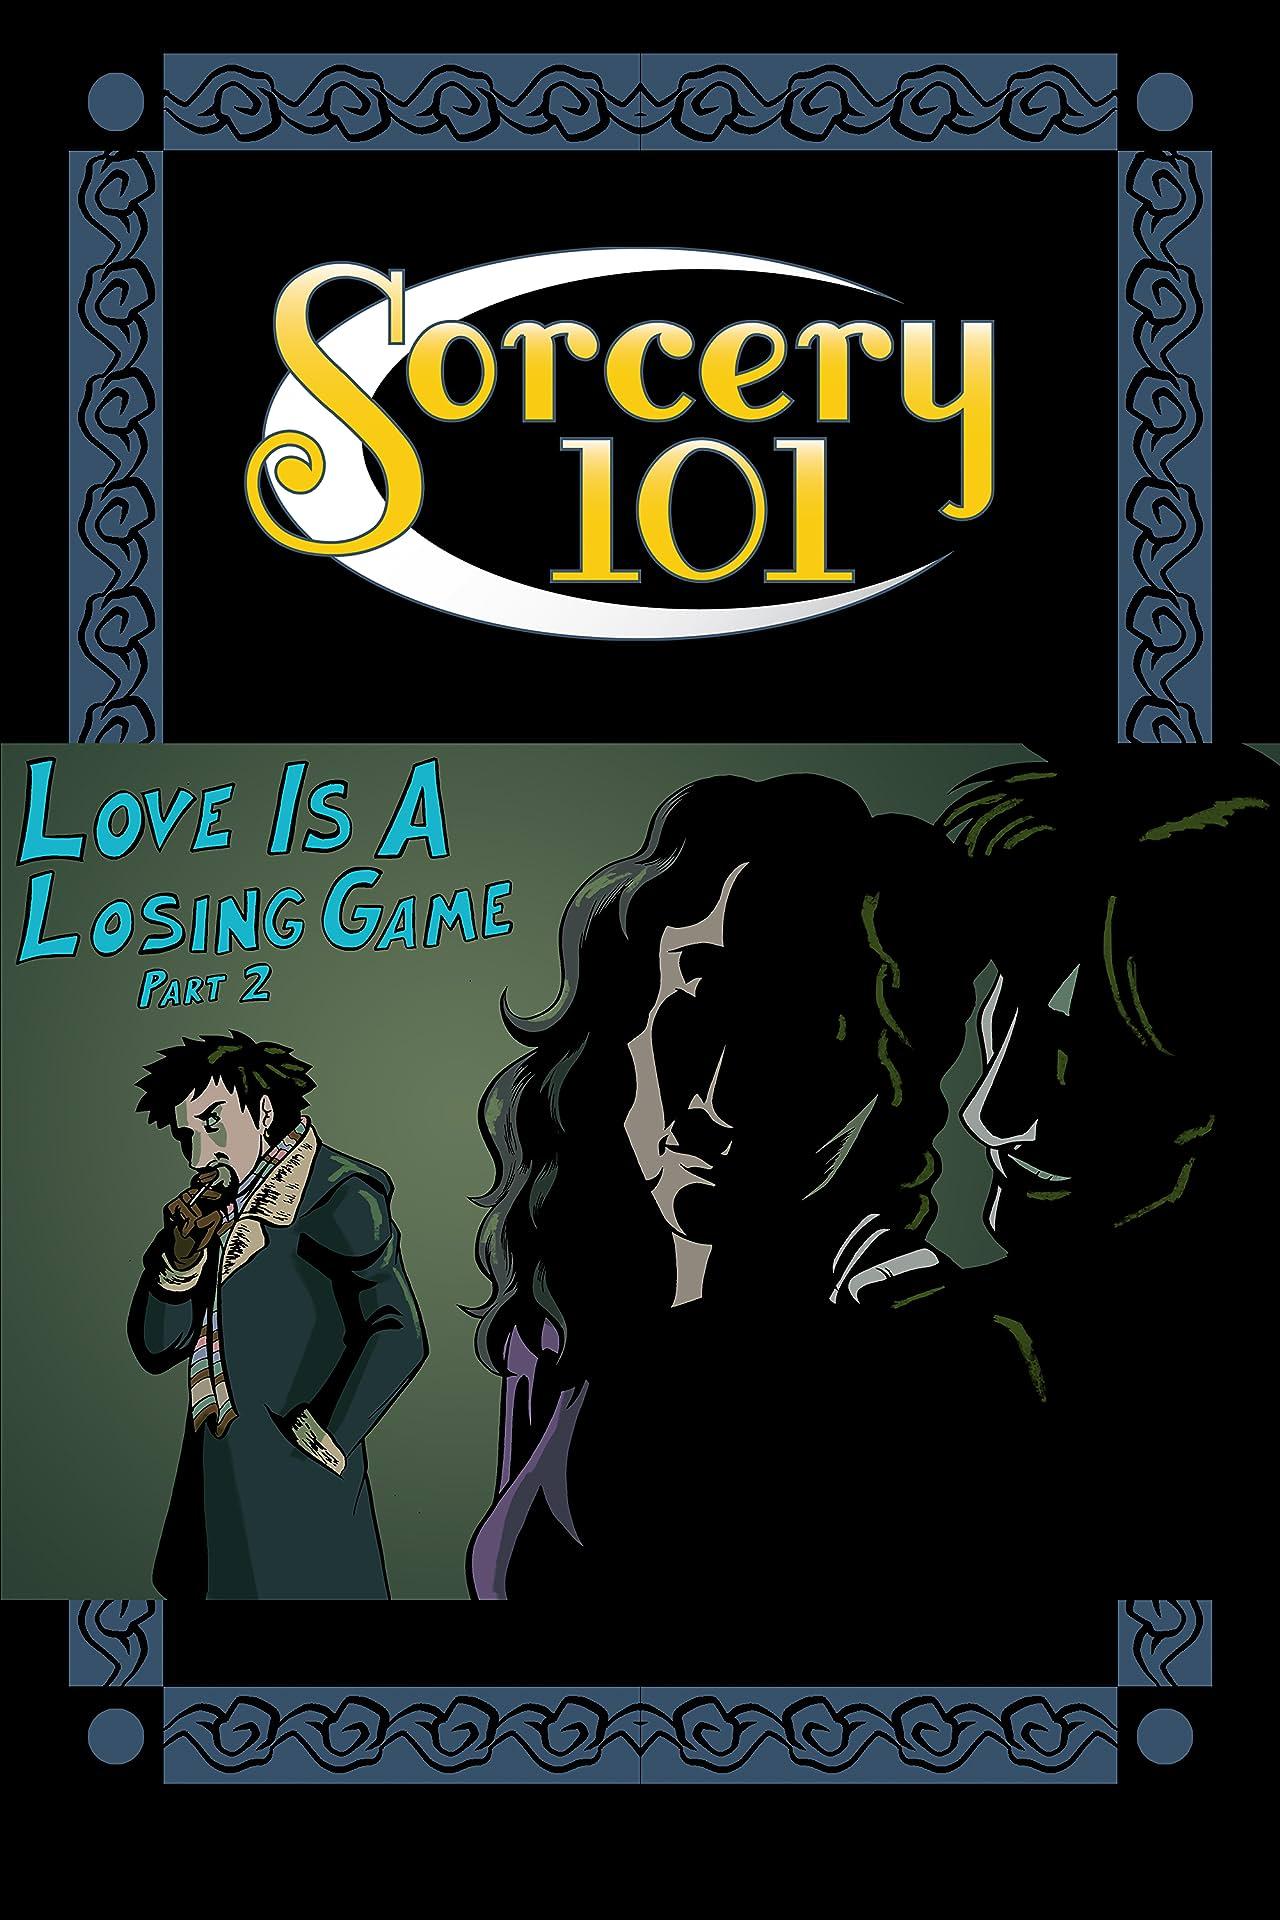 Sorcery 101 #30